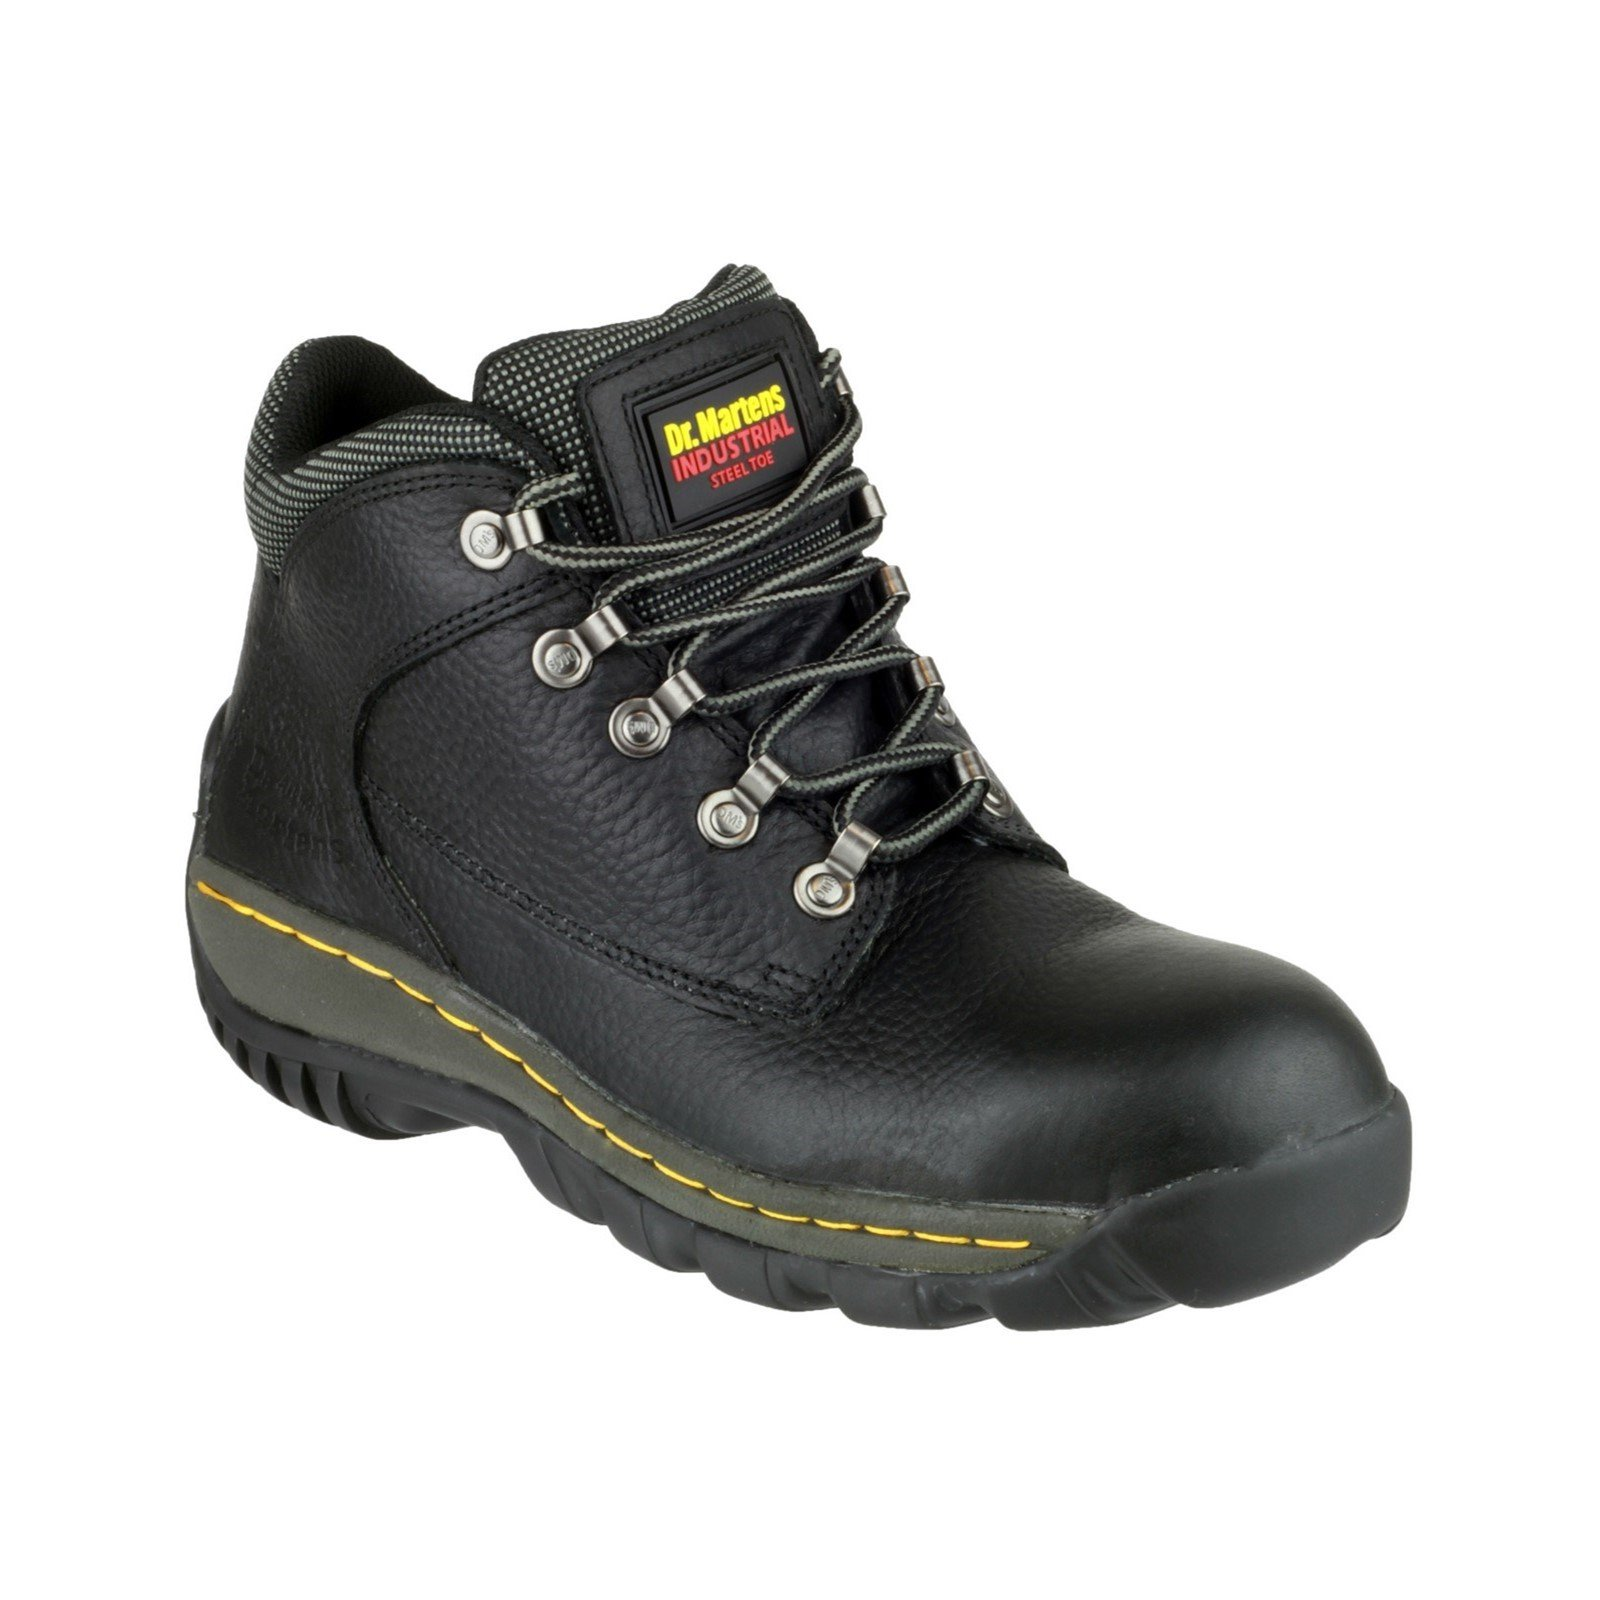 Dr Martens Unisex Lace-Up Boot Black 05207 - Black 10